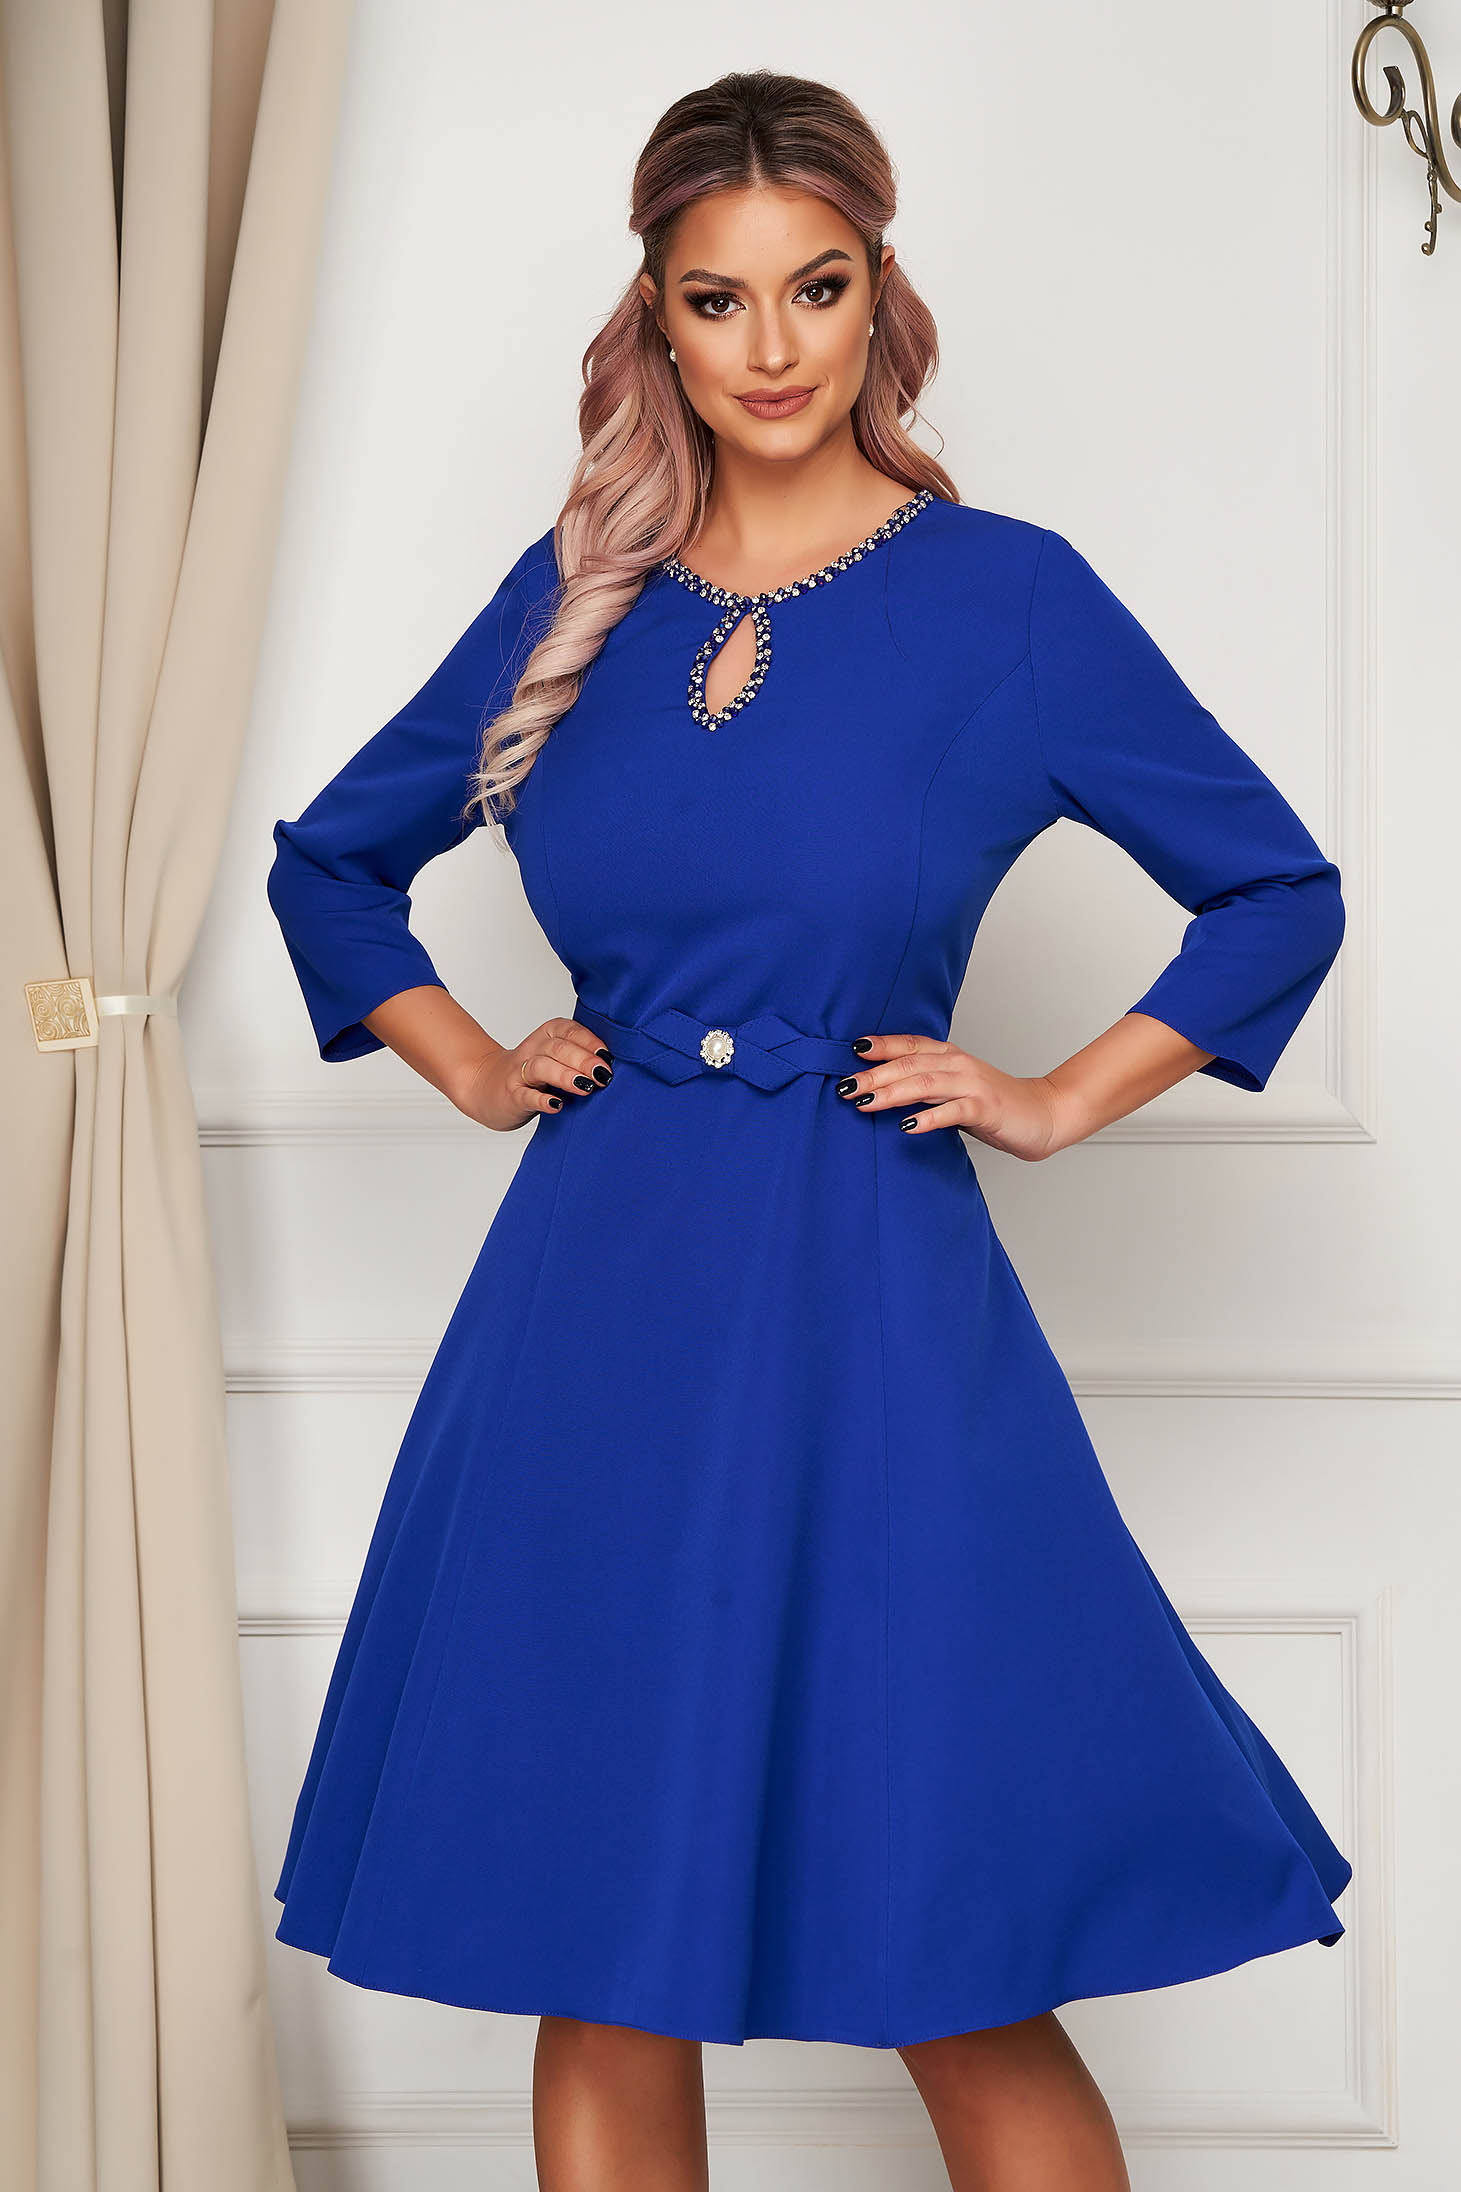 Blue dress midi elegant cloche cloth with crystal embellished details